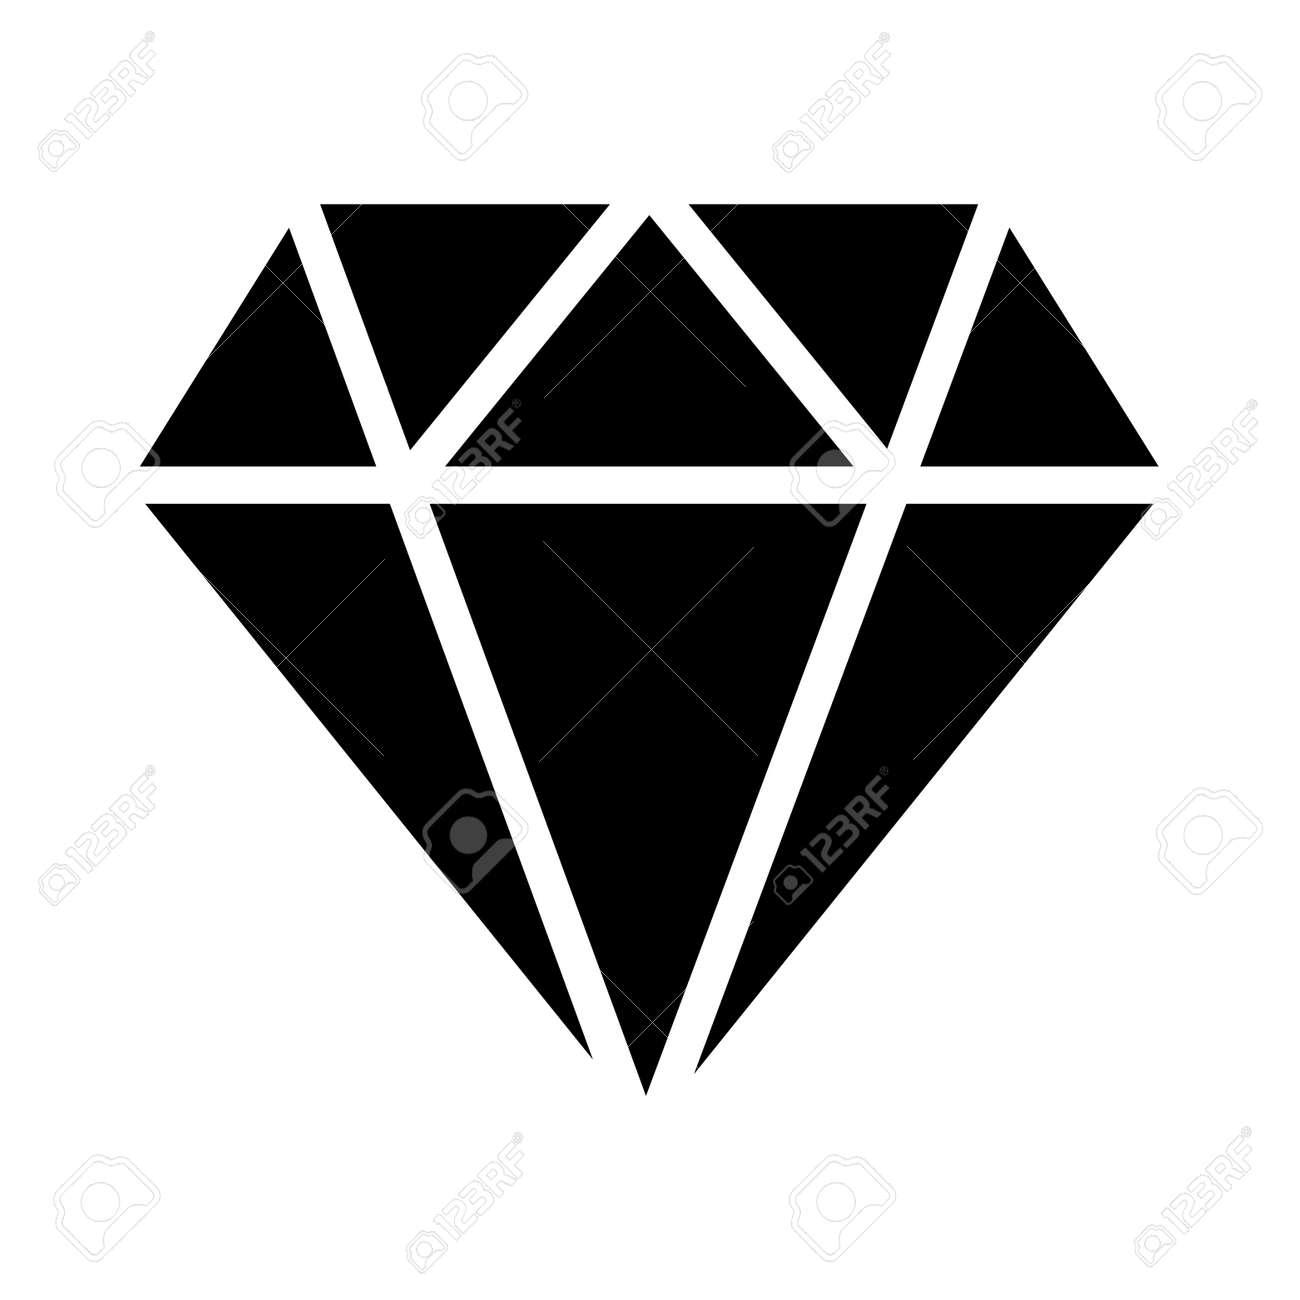 diamond icon. elements of web icon. premium quality graphic design..